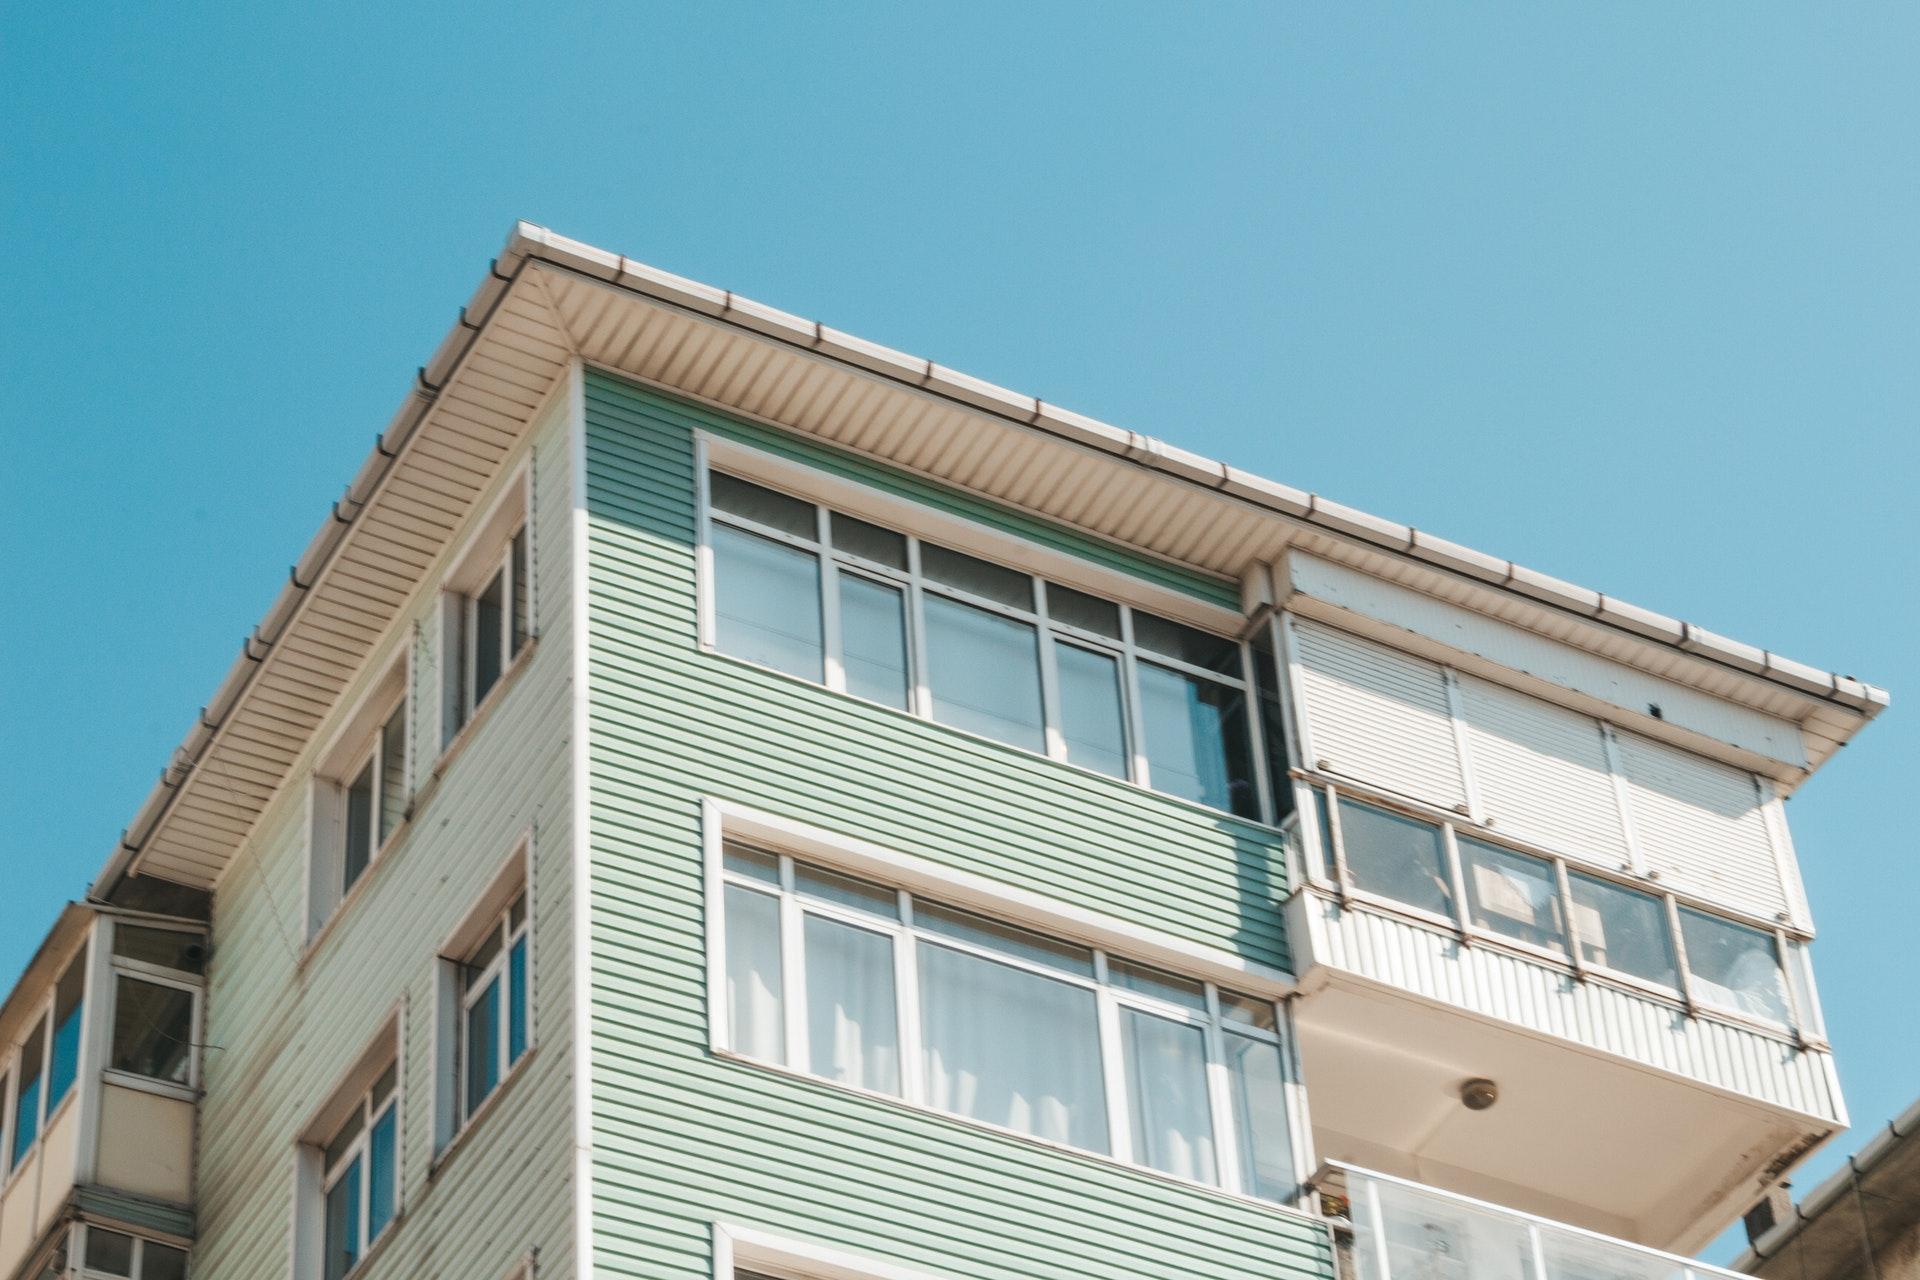 Balcon inchis